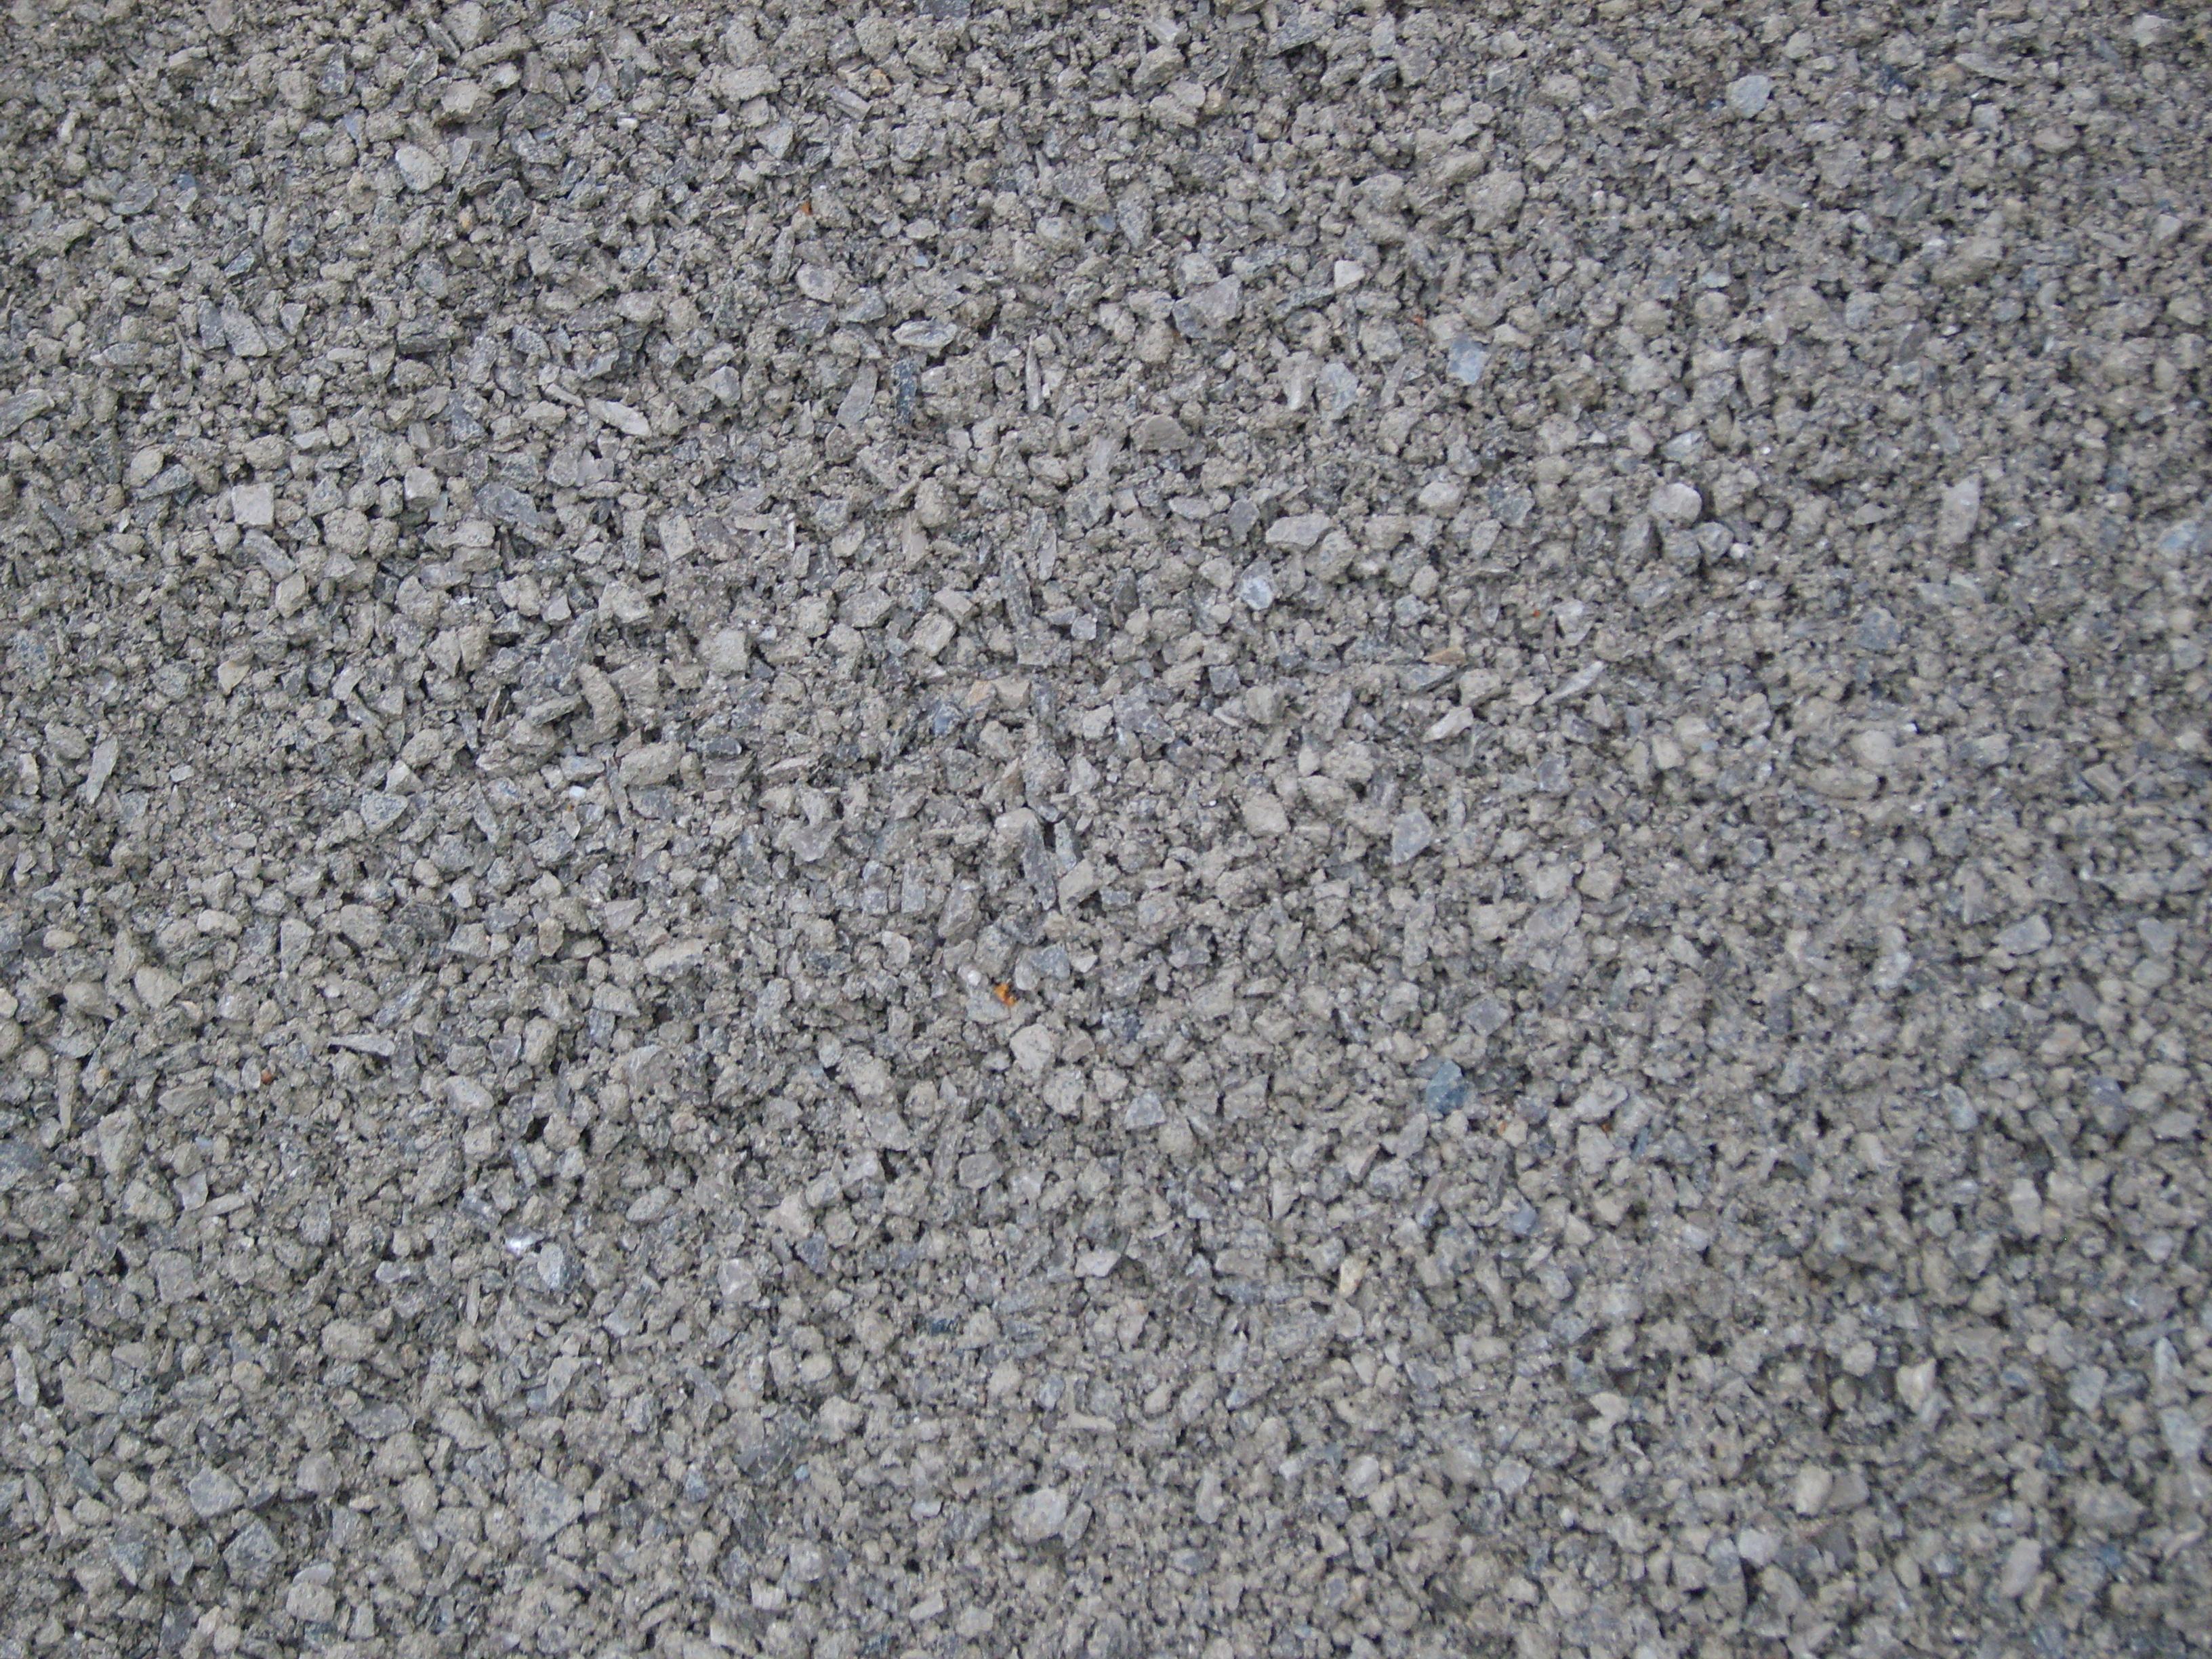 Gravel Texture II by PaulineMoss on DeviantArt